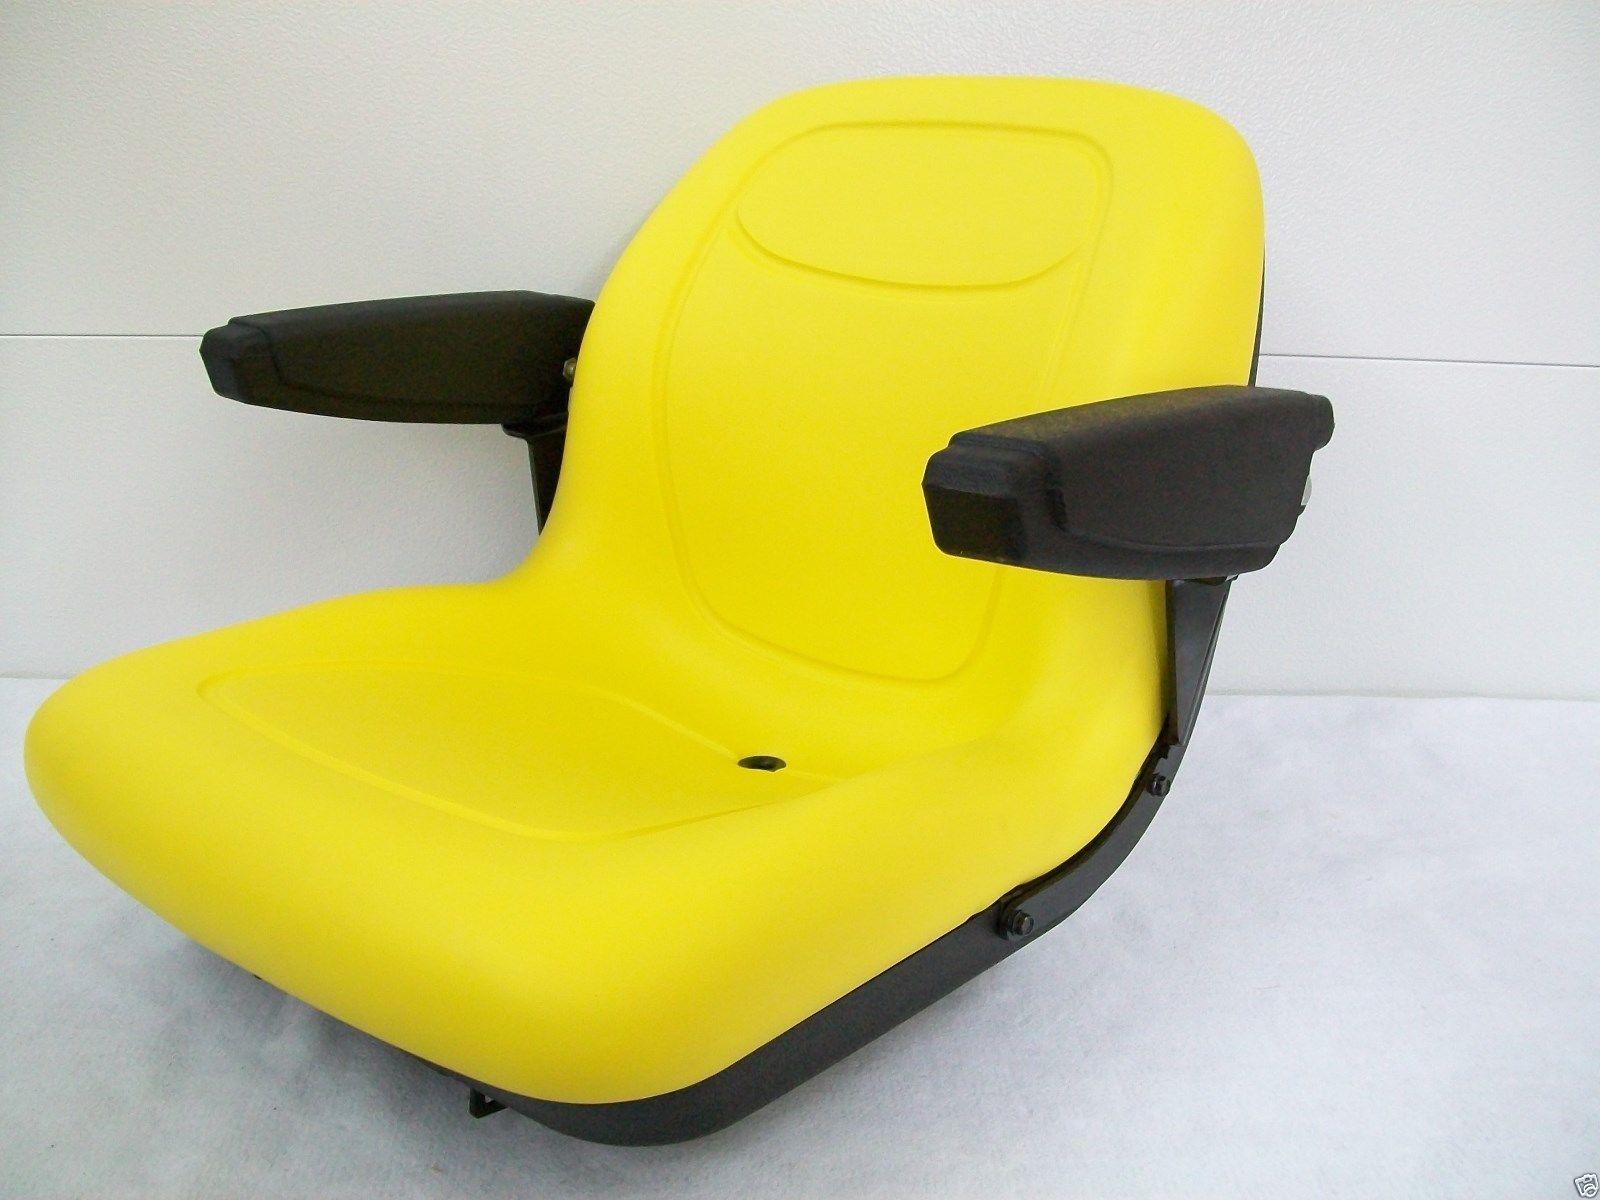 John Deere 1050 Tractor Seat : High back yellow seat fits  john